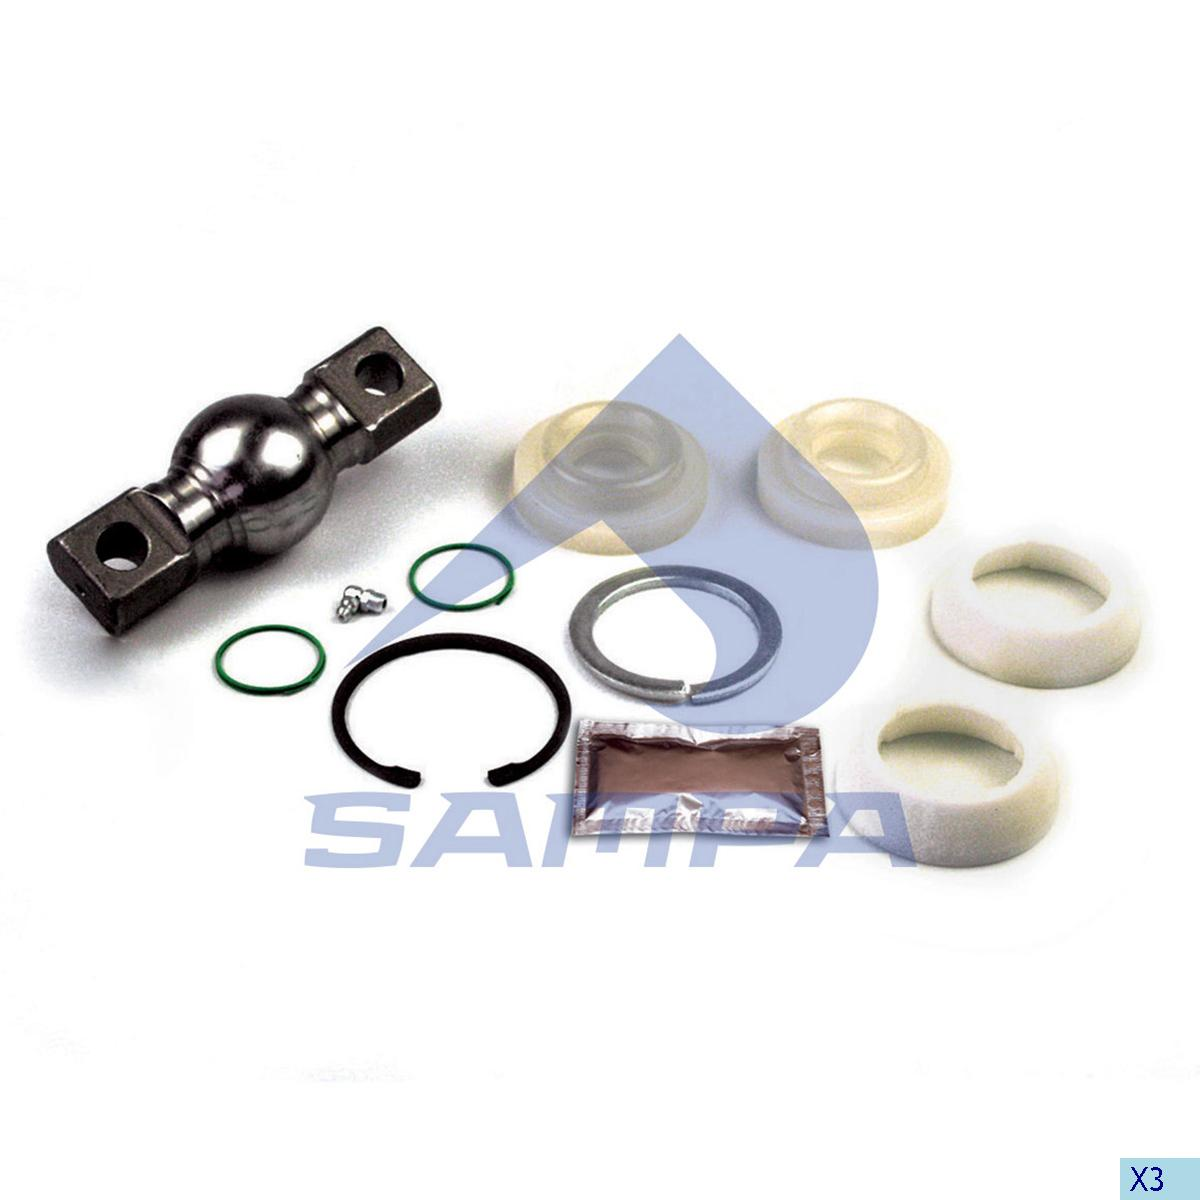 Repair Kit, Axle Rod, R.V.I., Suspension